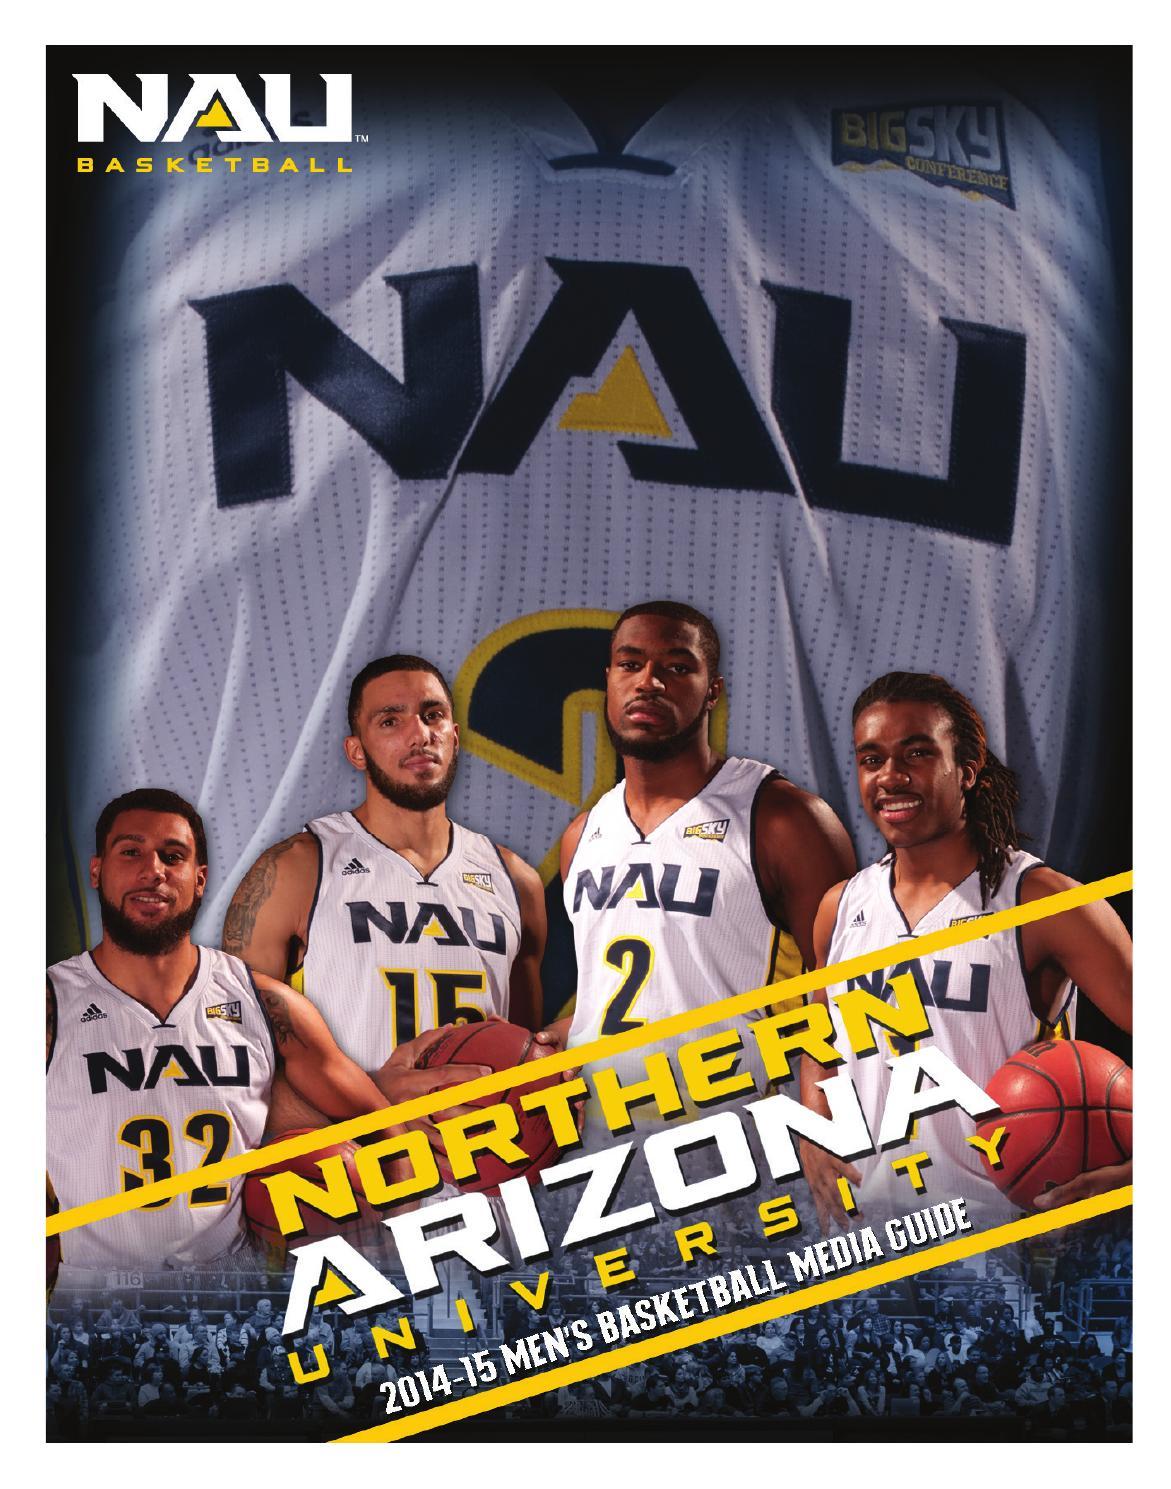 07d7d4a0d3b5 2014-15 NAU Men s Basketball Media Guide by NAU Athletics - issuu